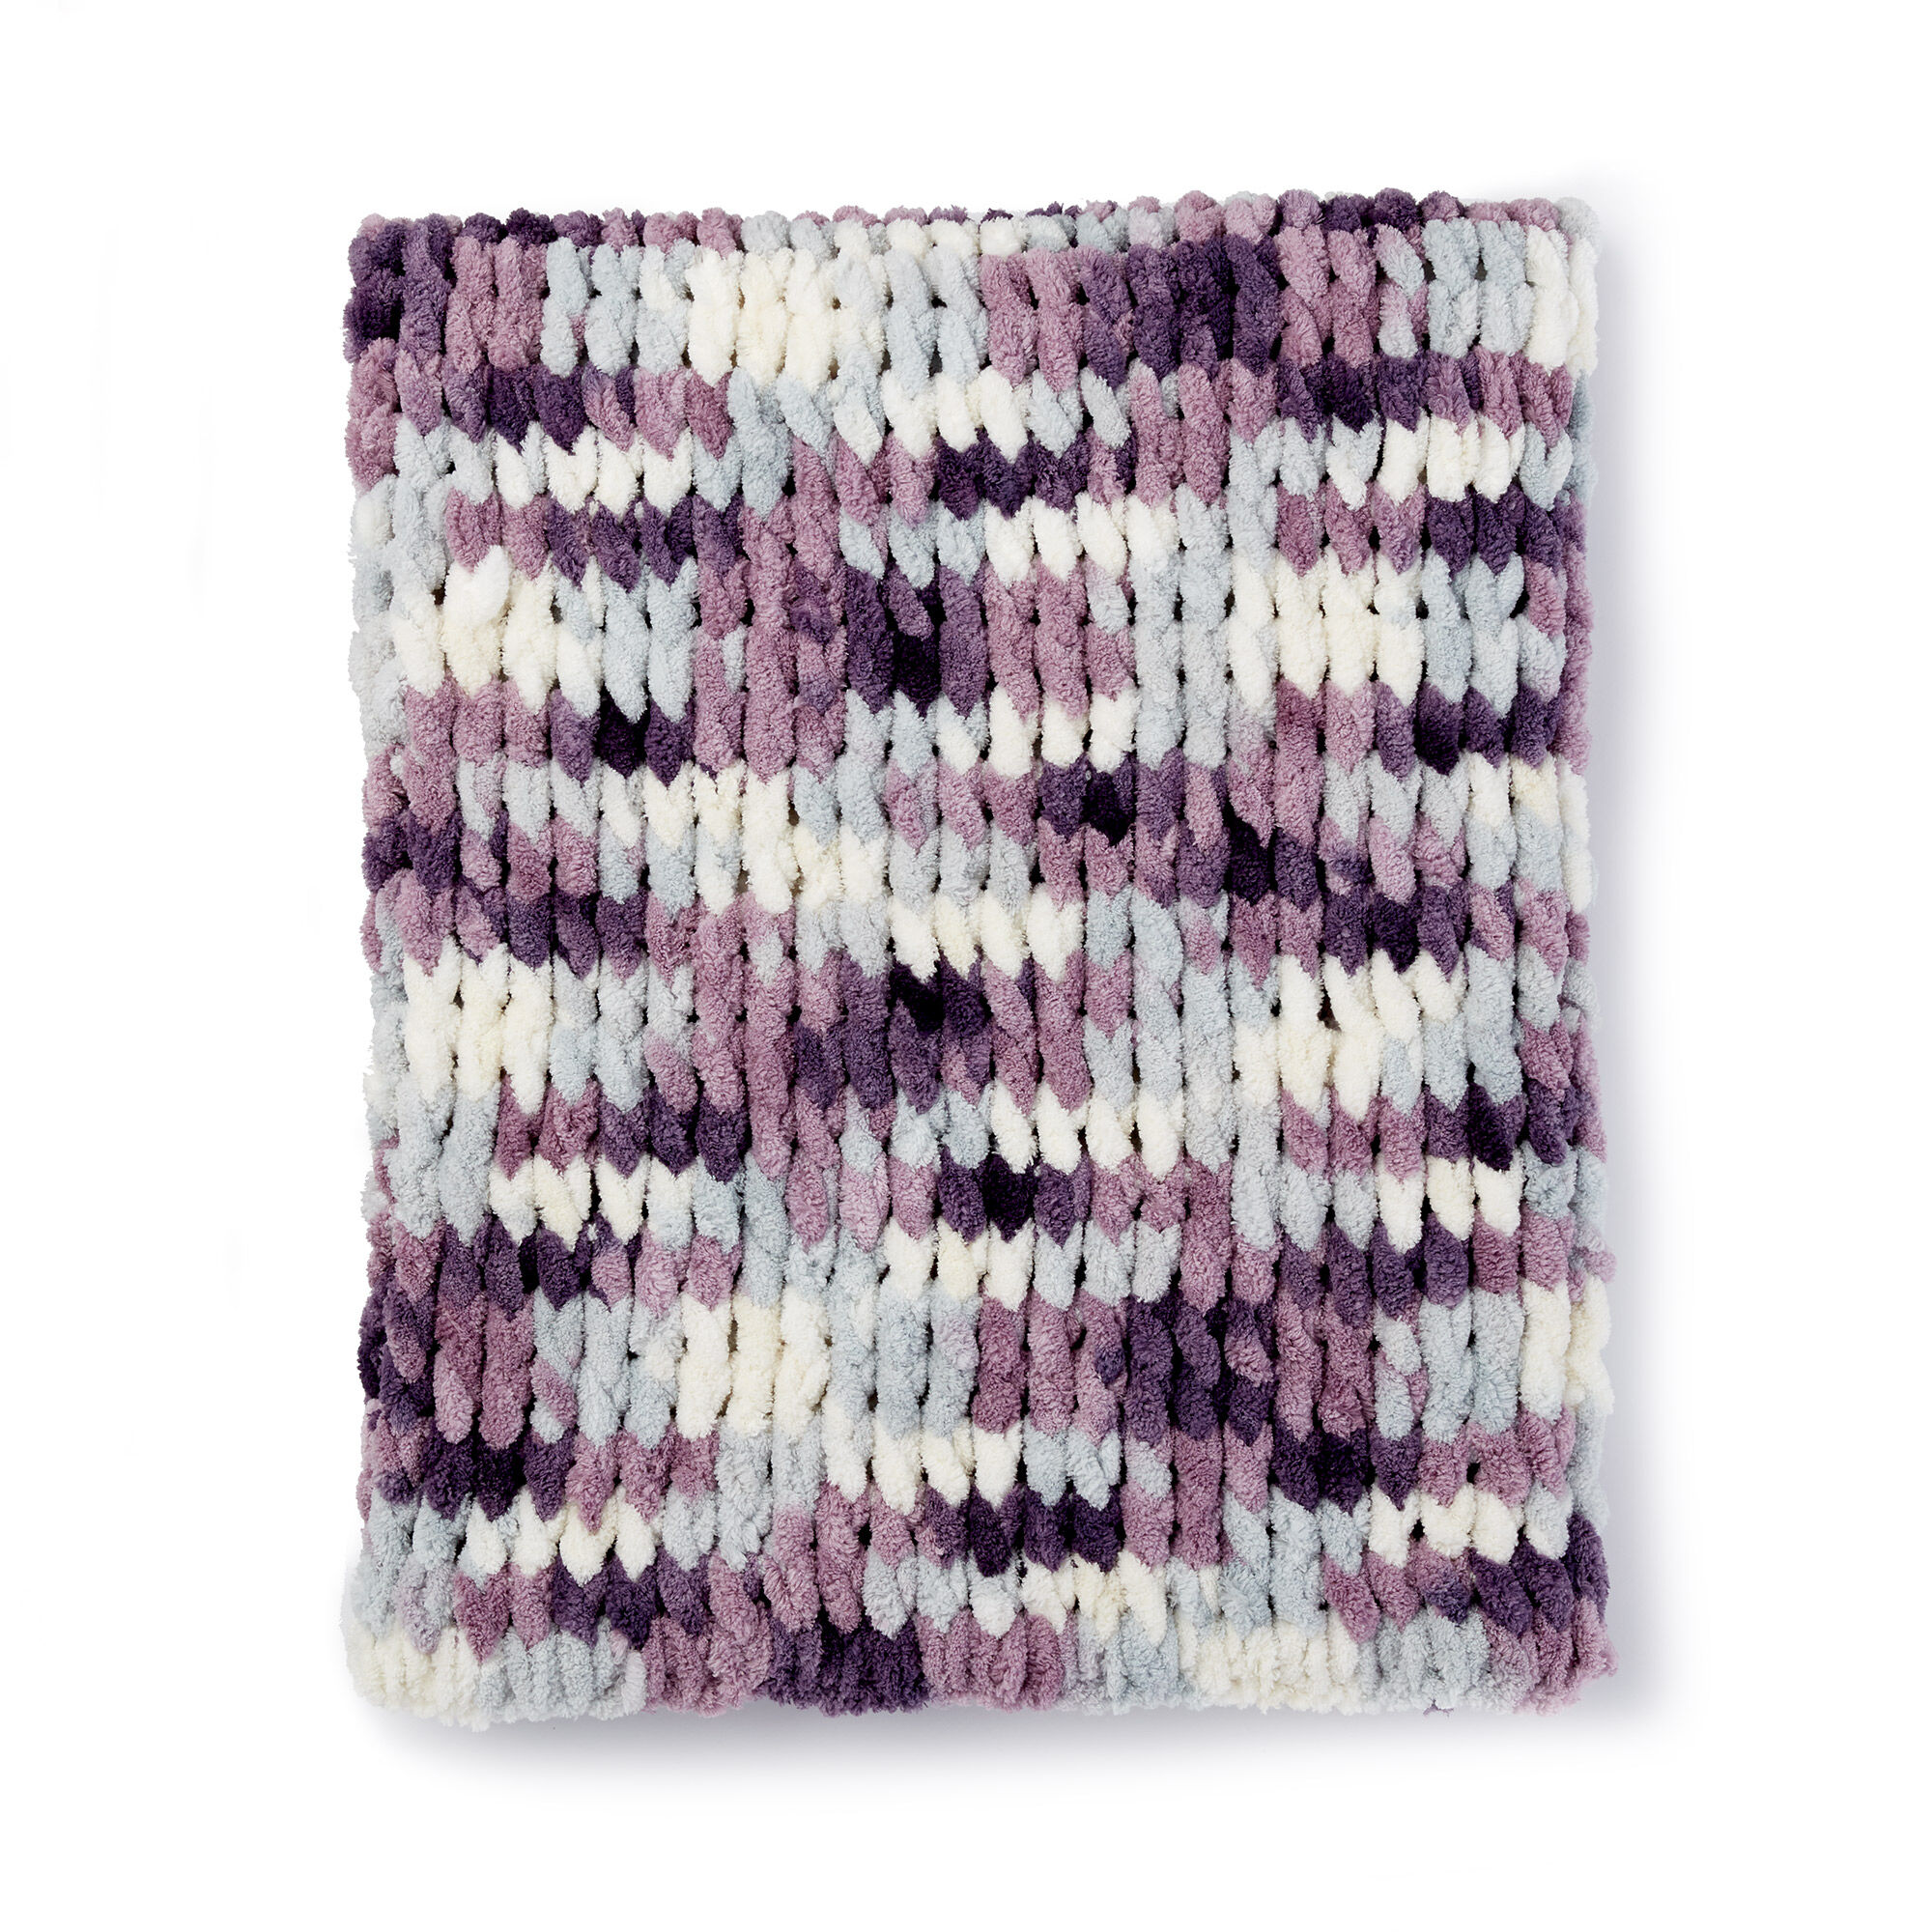 How many skeins of loop yarn to make a baby blanket